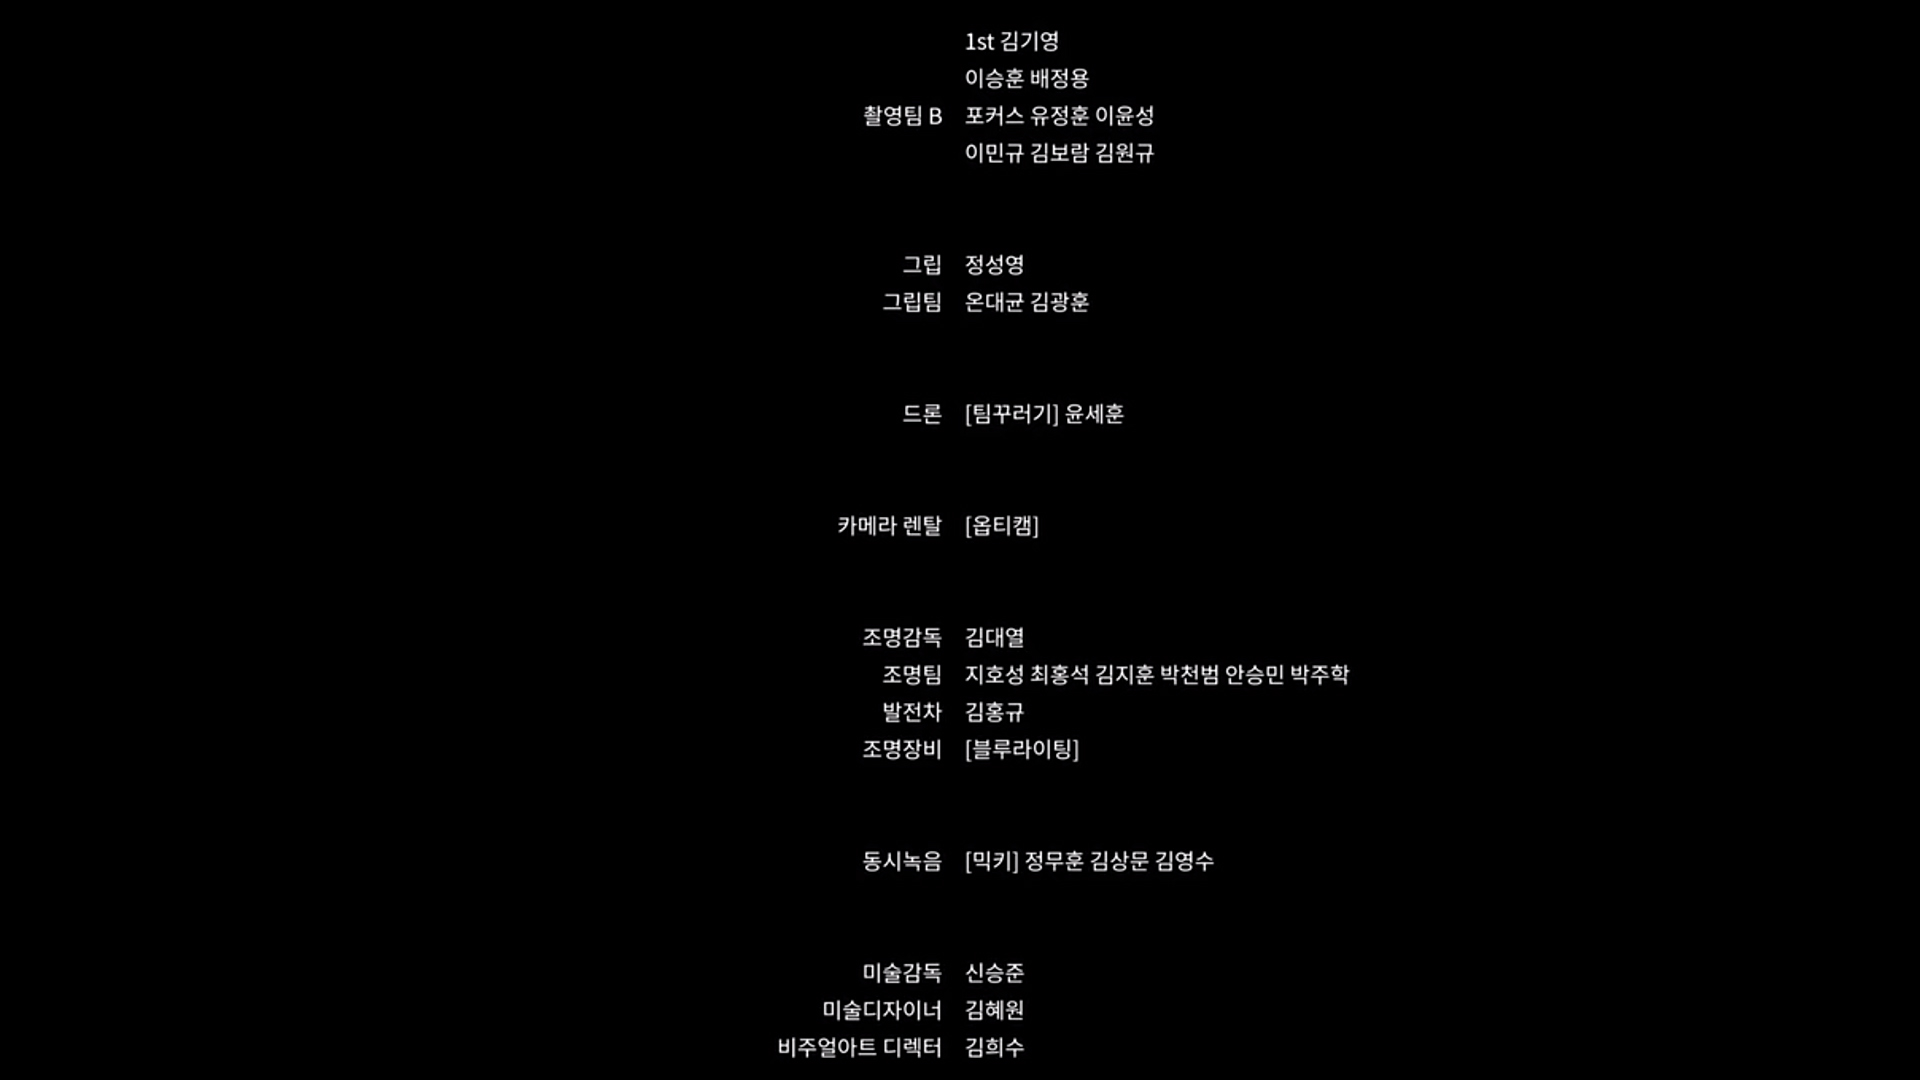 SBS 드라마 '배가본드'